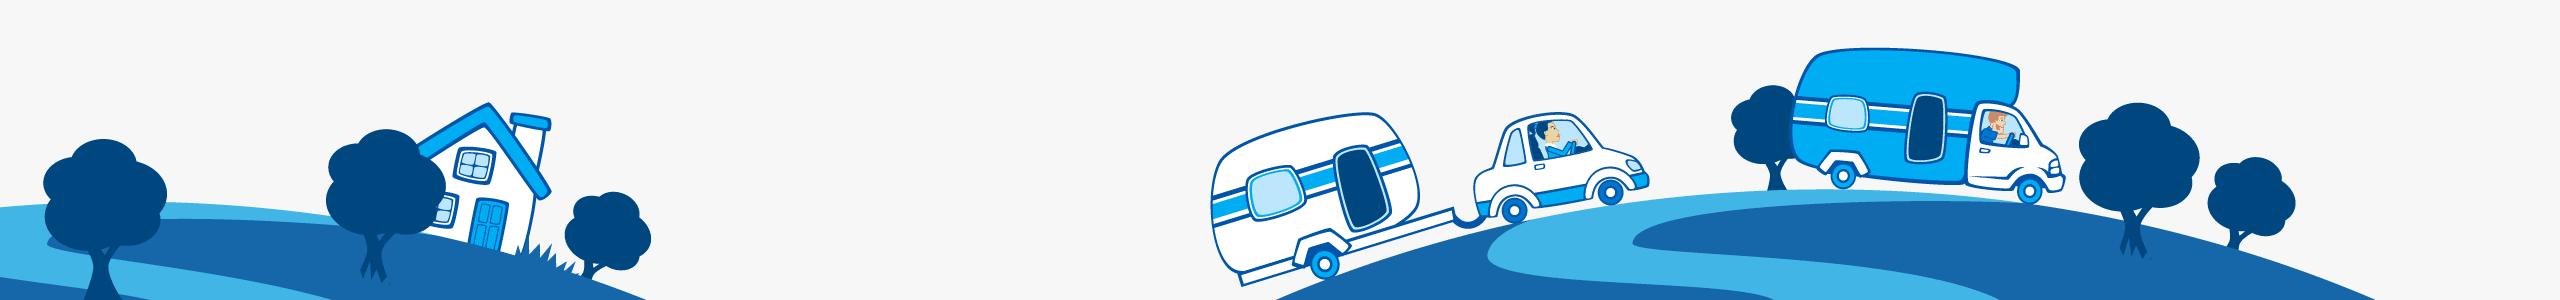 caravan loans background